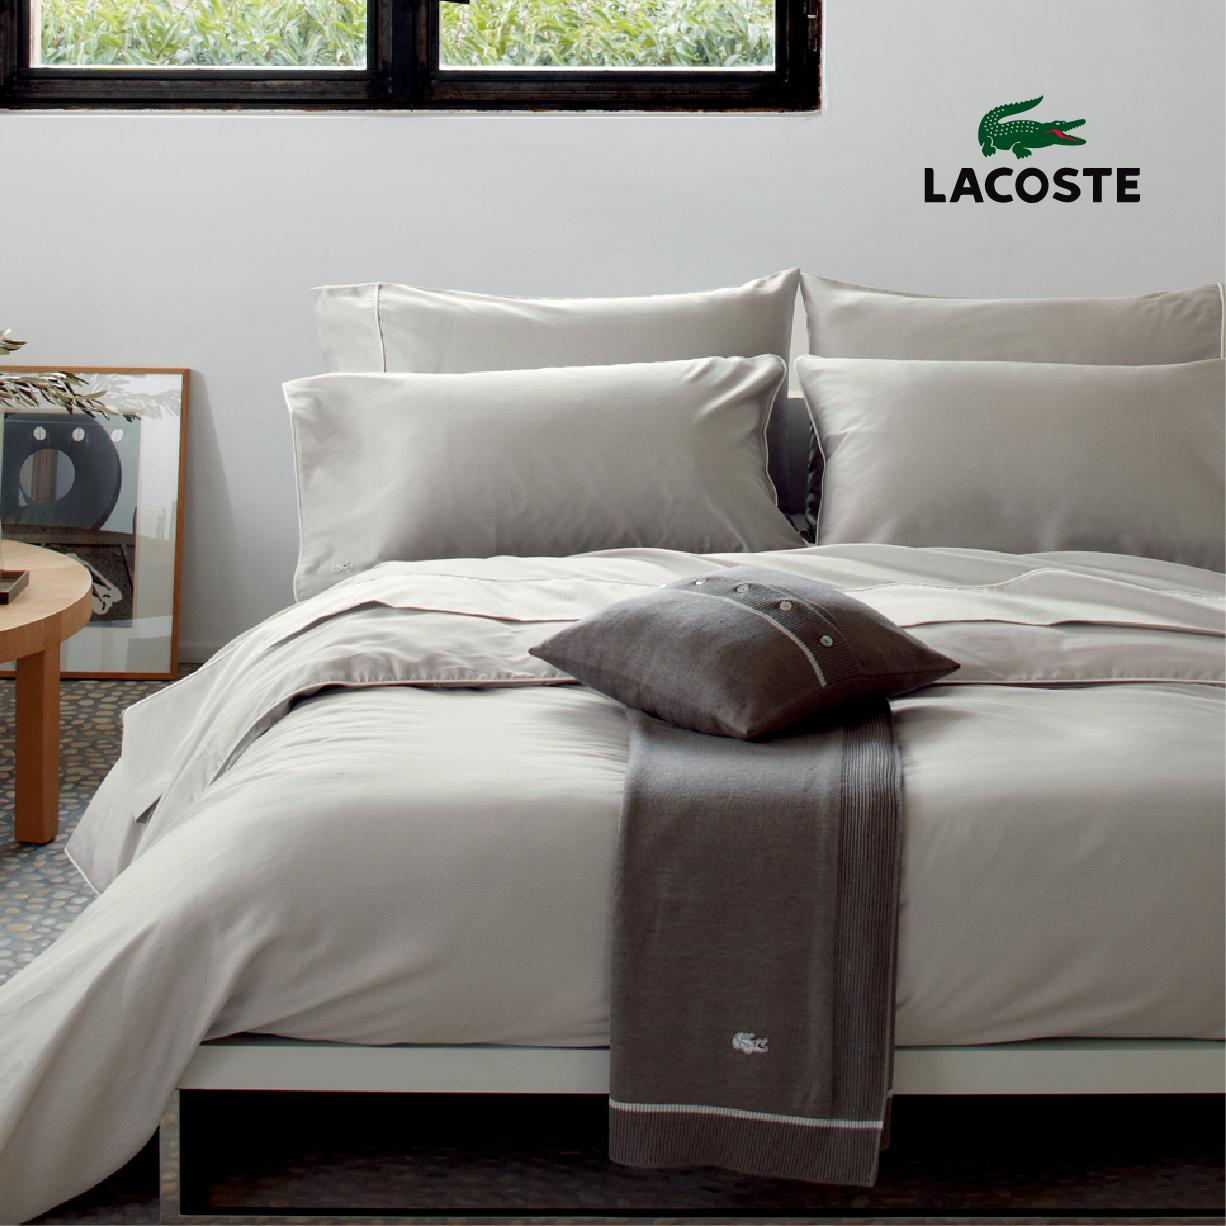 【LACOSTE】法國原裝加大床組PIQUE